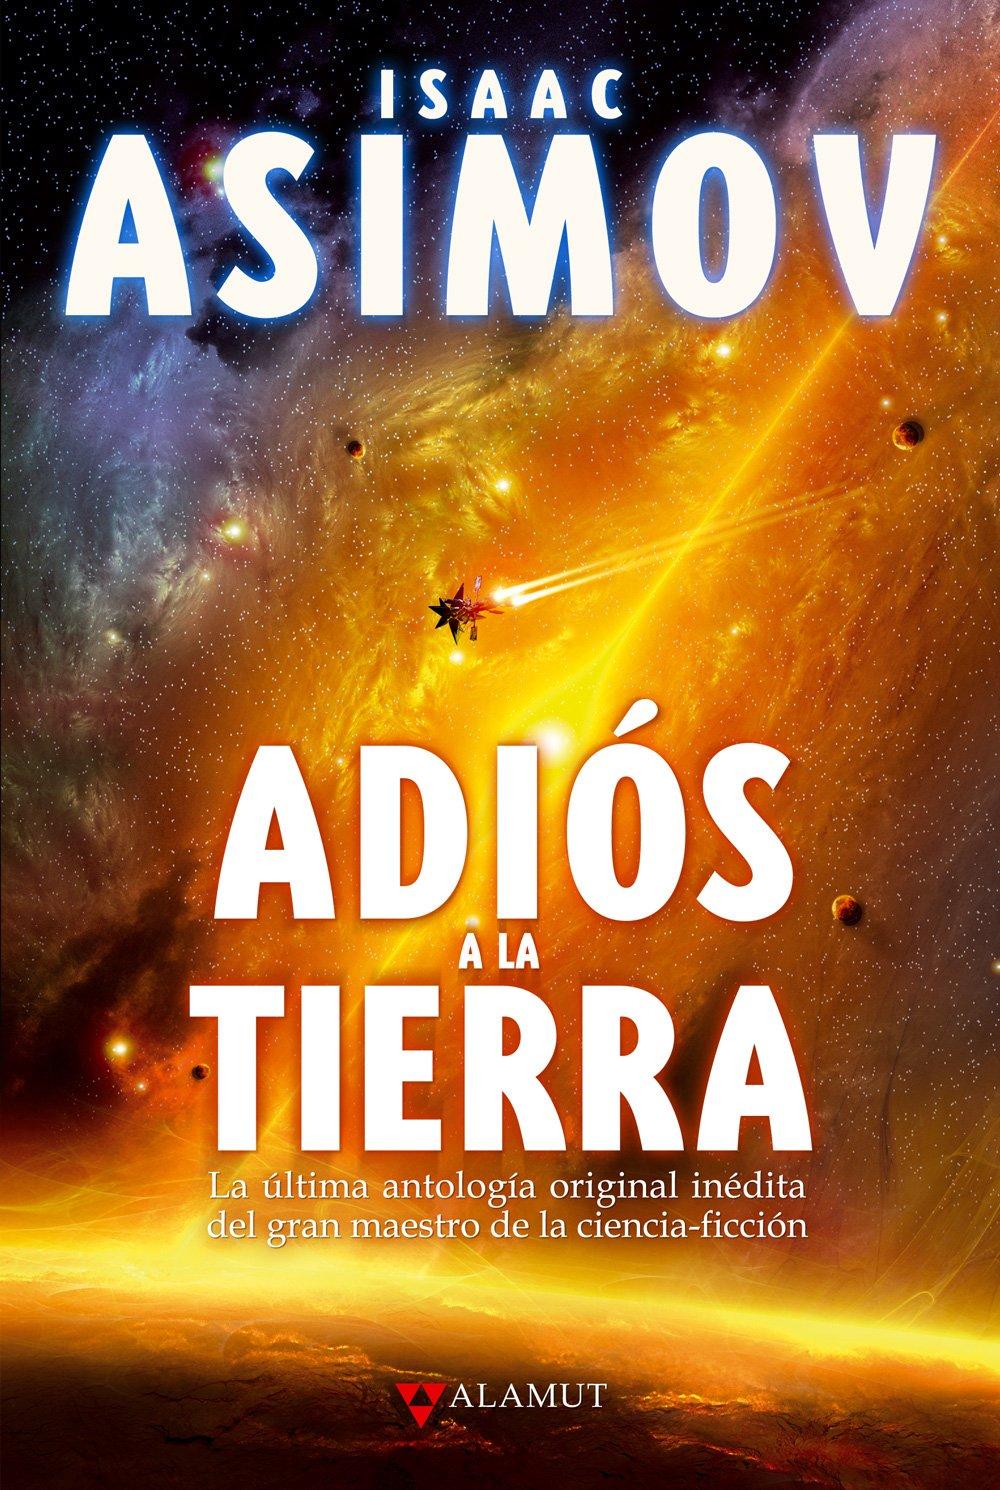 Alamut: Isaac Asimov. Adiós a la Tierra